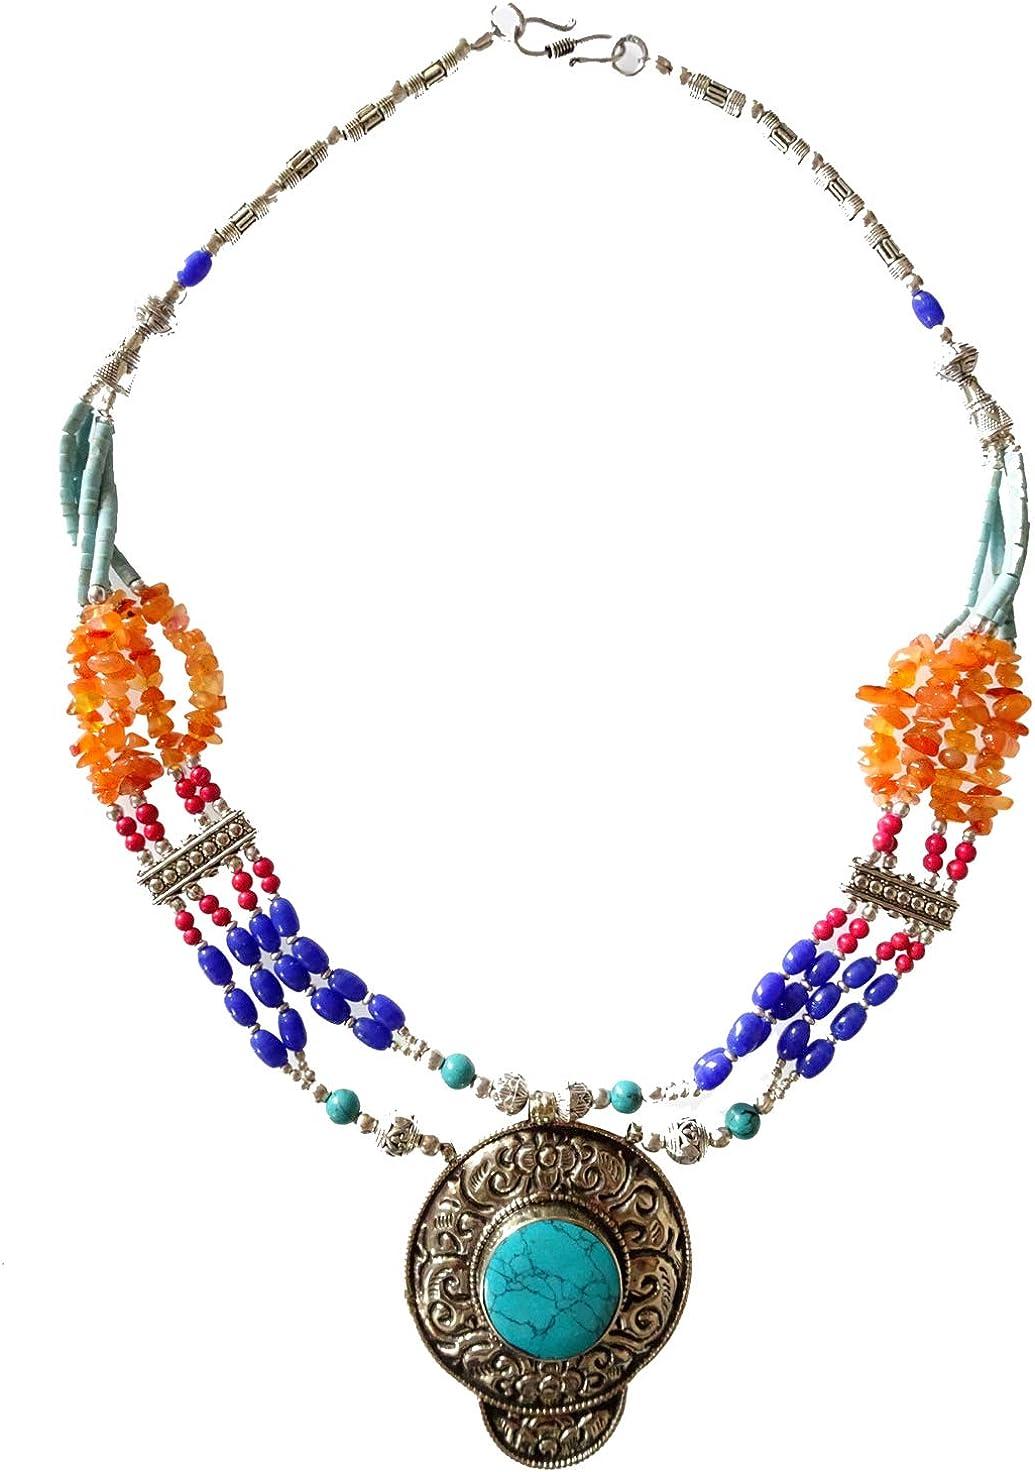 Collar de moda con piedras preciosas de ámbar, coral, lapislázuli y turquesa para mujer niña hecho a mano, étnico, tribal, largo, colgante, multa, budista, boho, gargantilla, collar tibetano